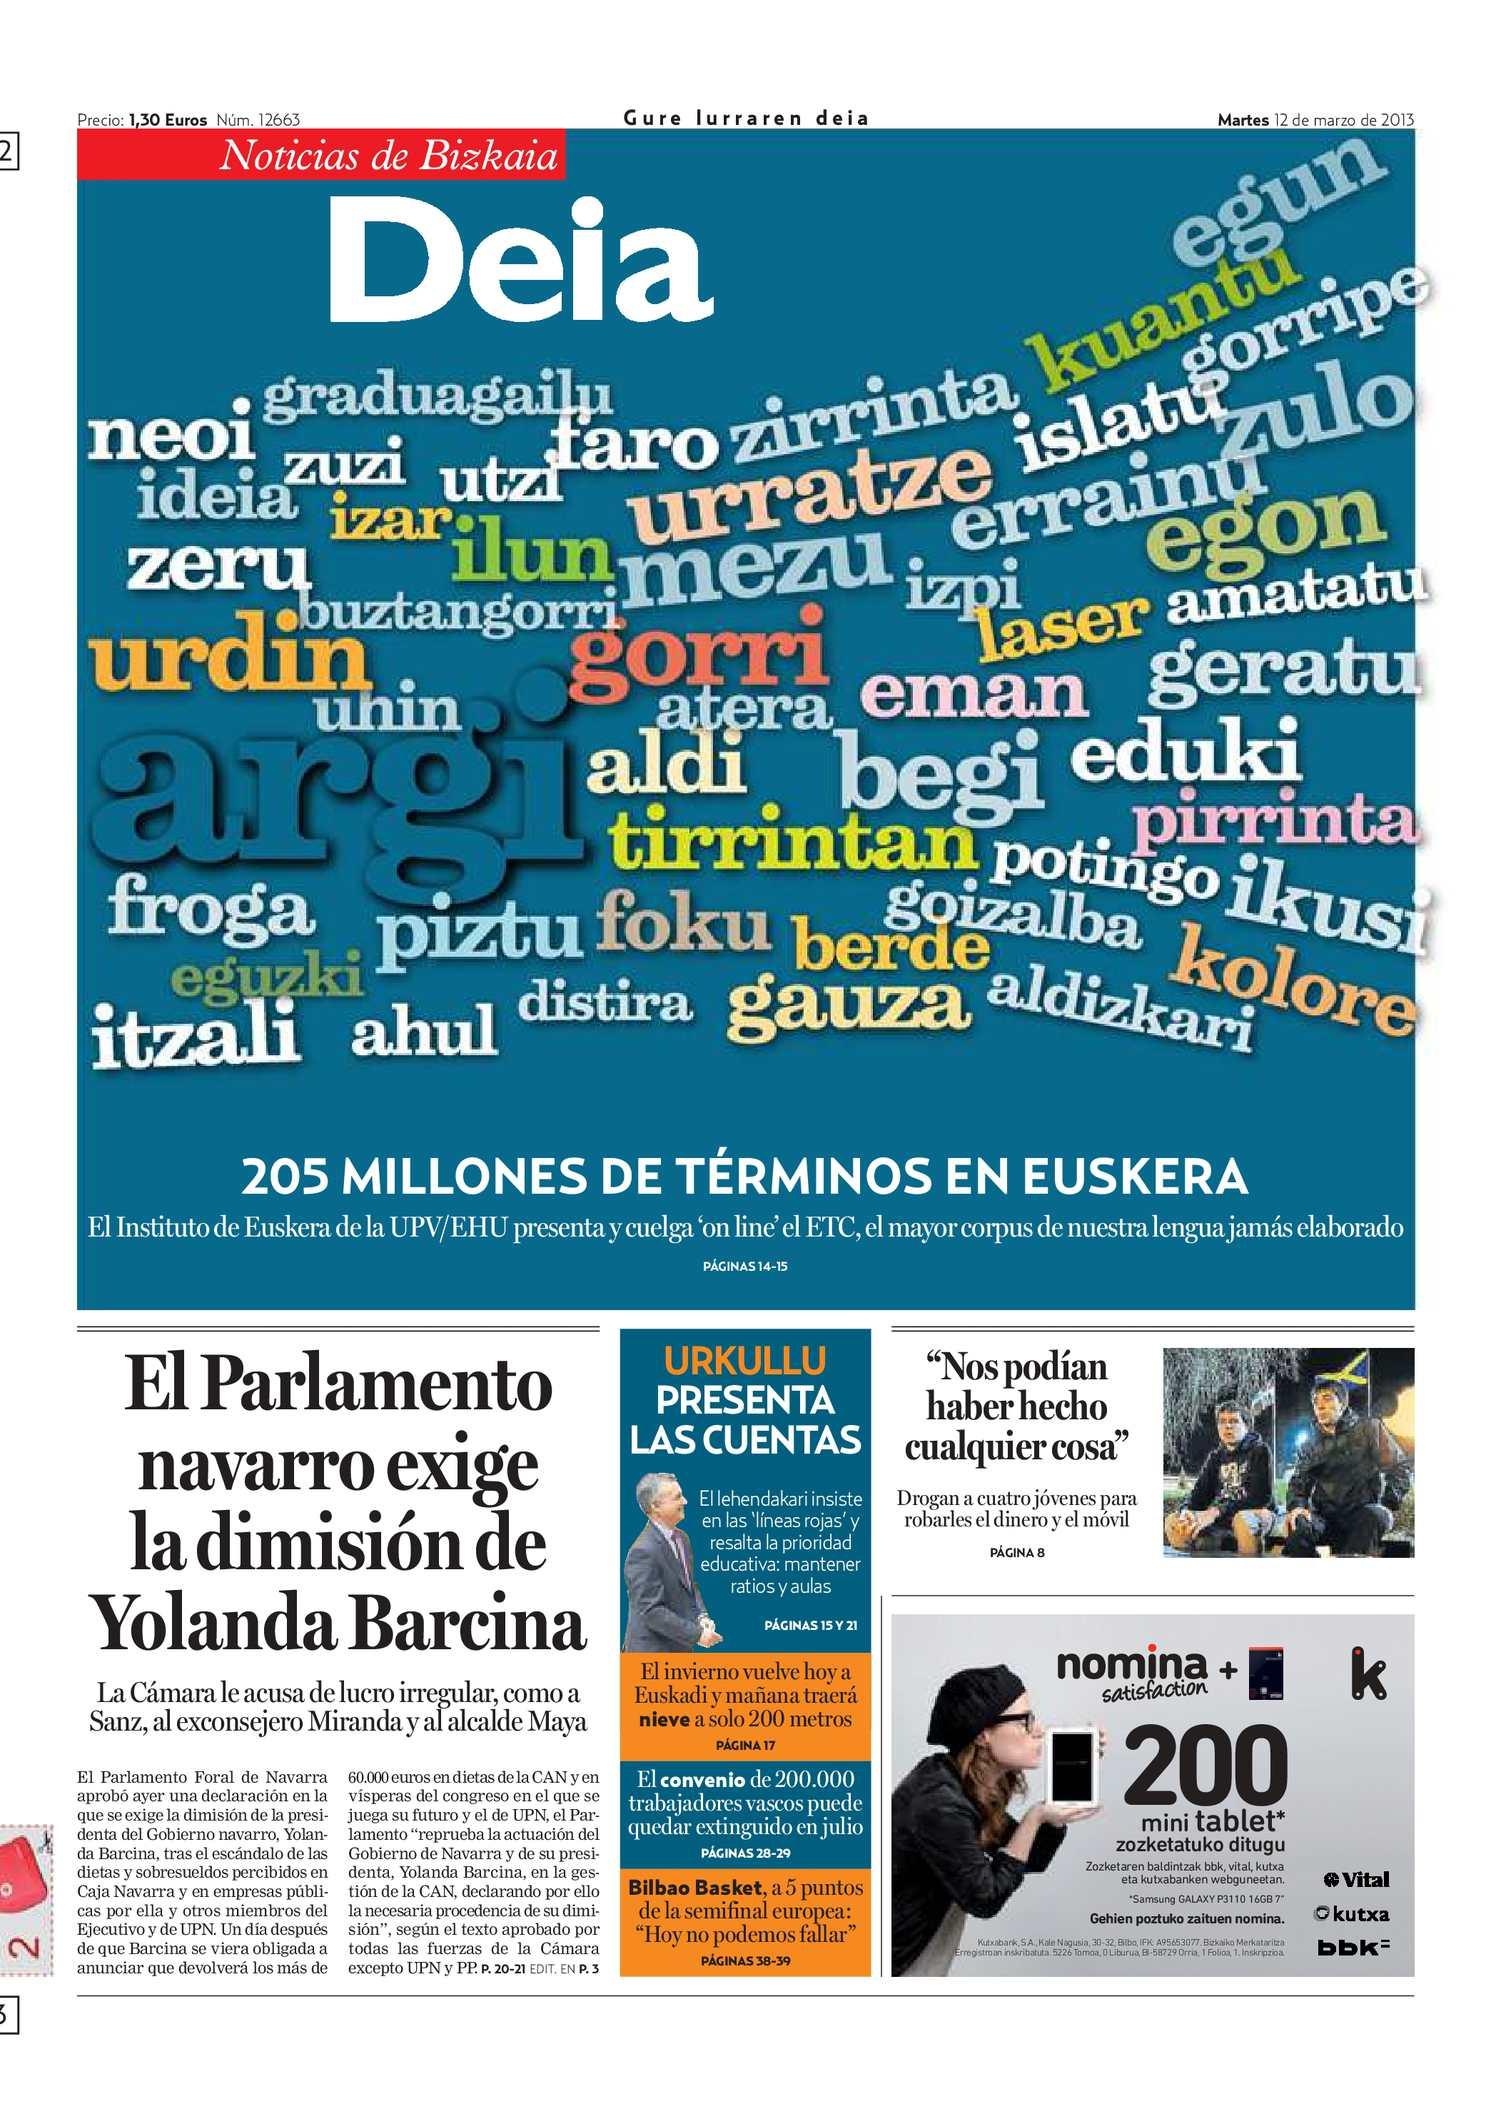 Calaméo - Deia 20130312